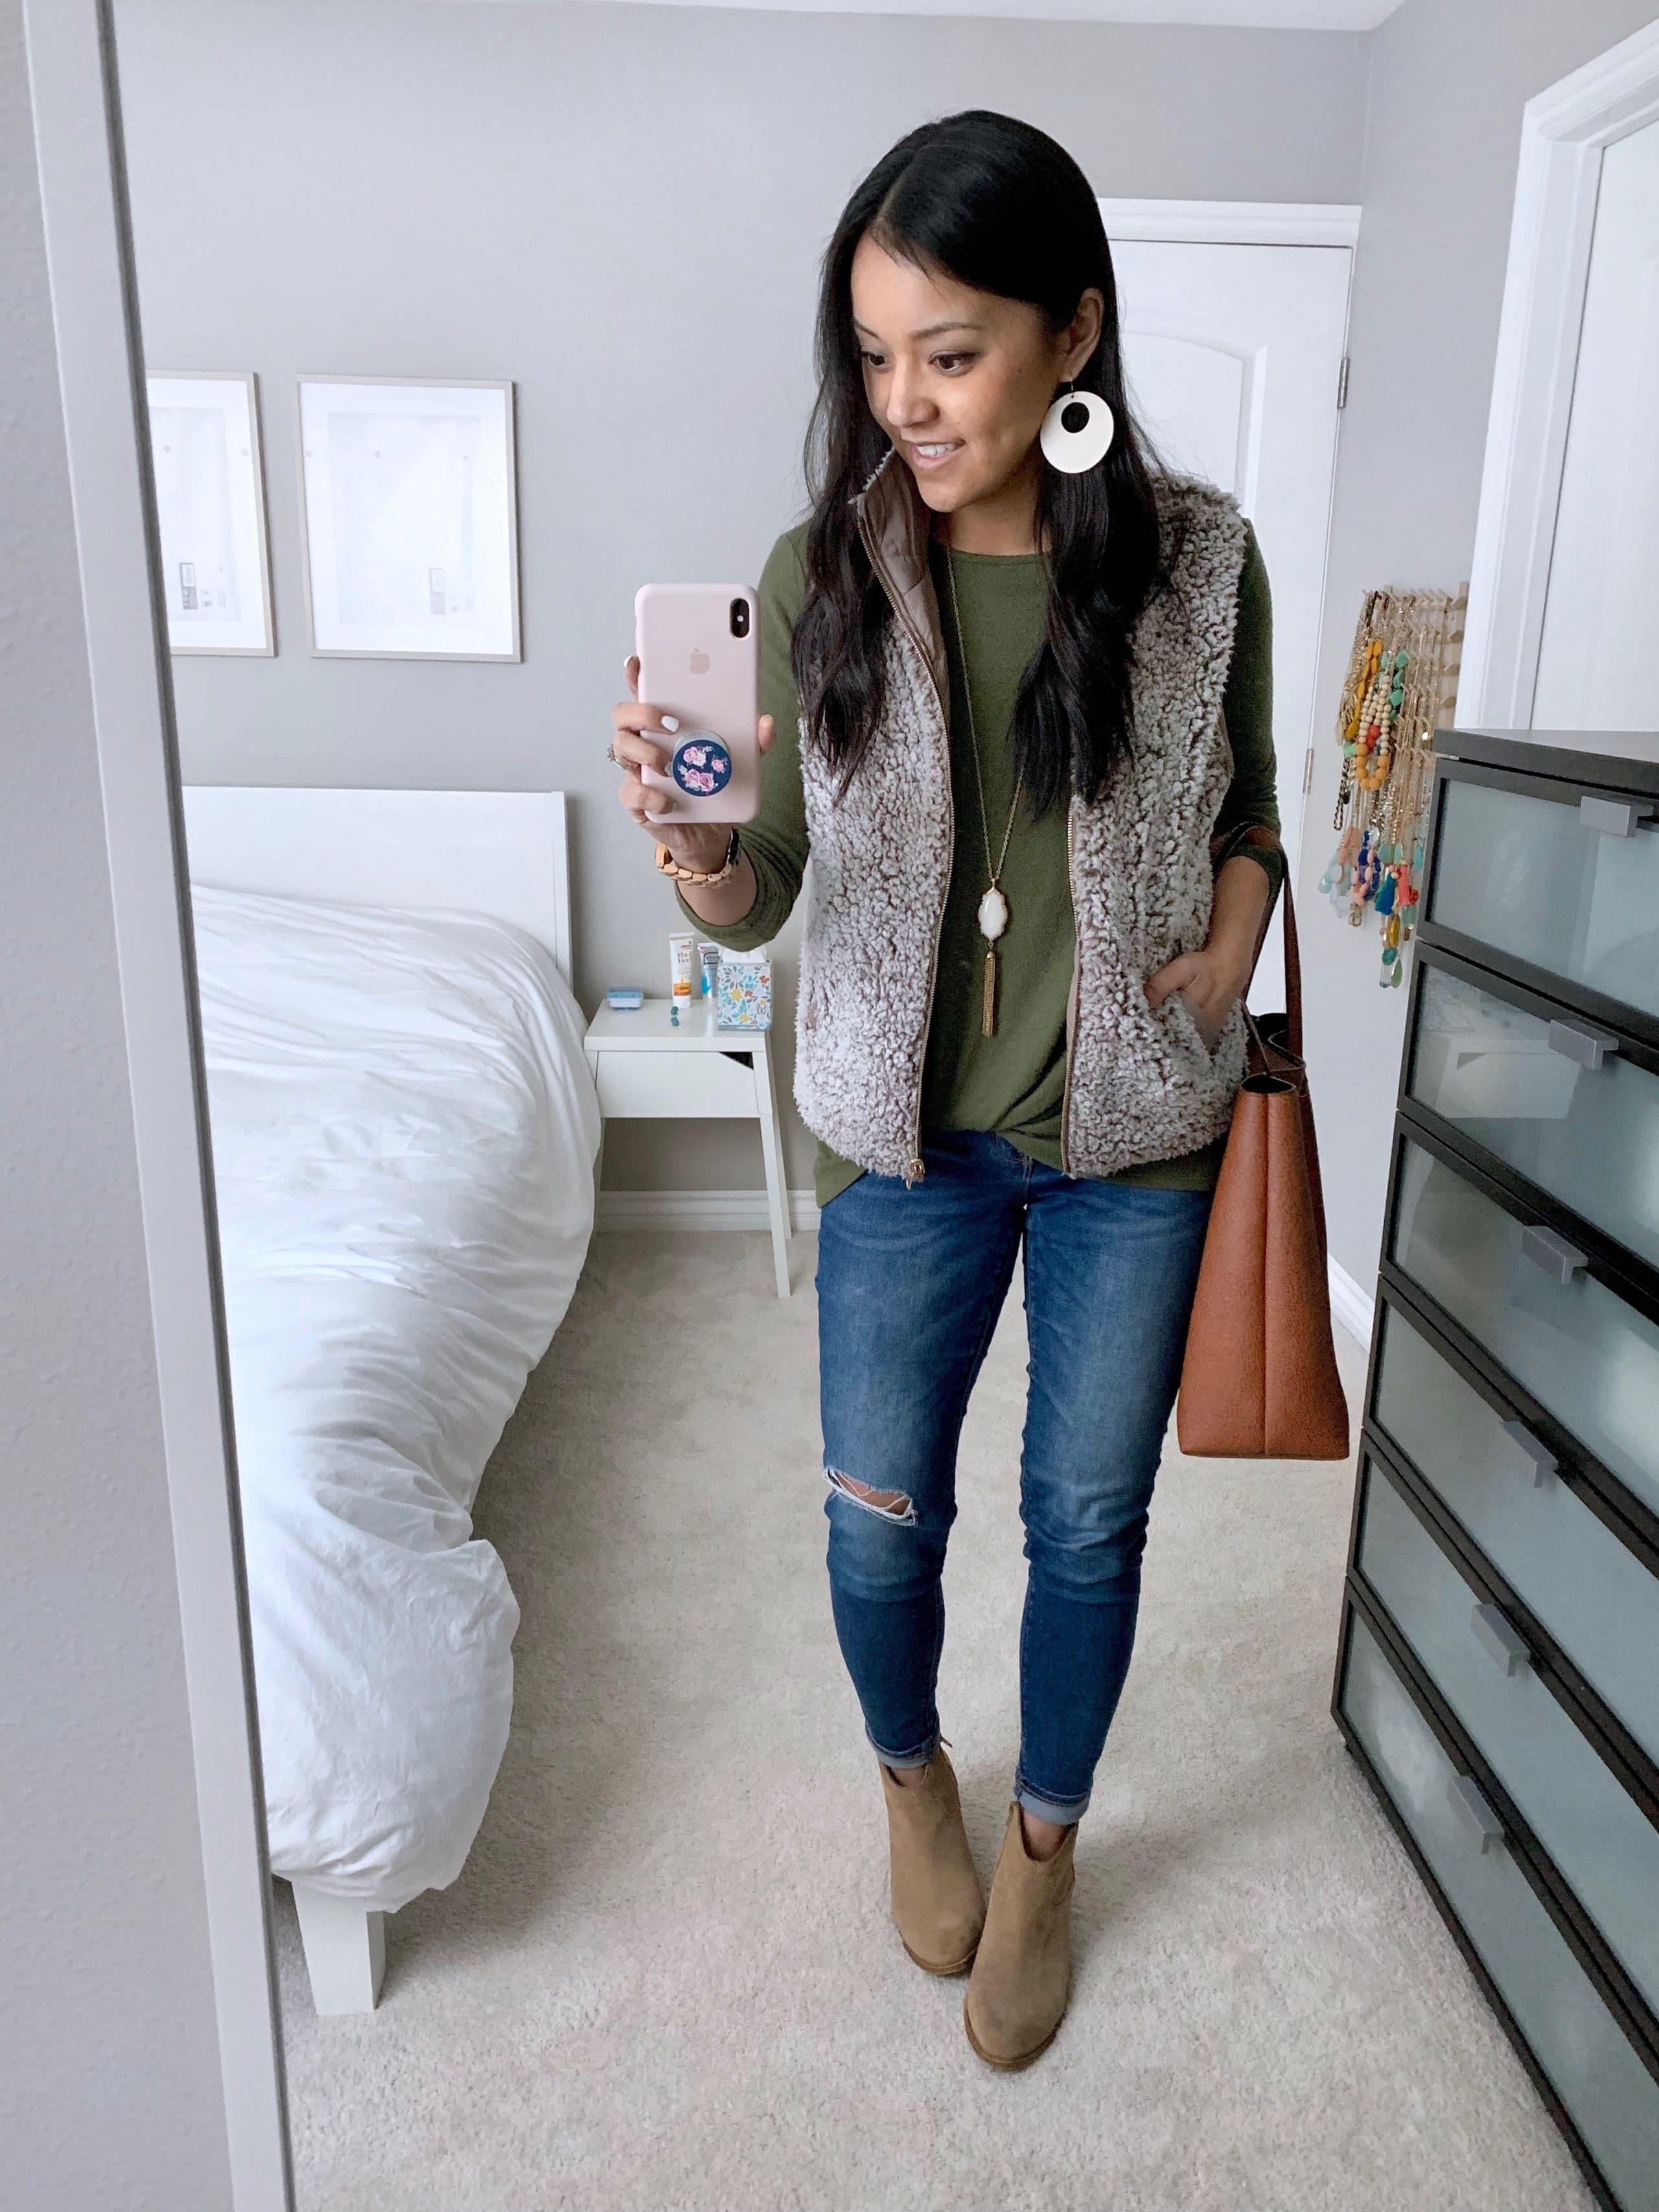 Fuzzy Vest + Olive Twist Tee + Statement Earrings + Distressed jeans + Booties